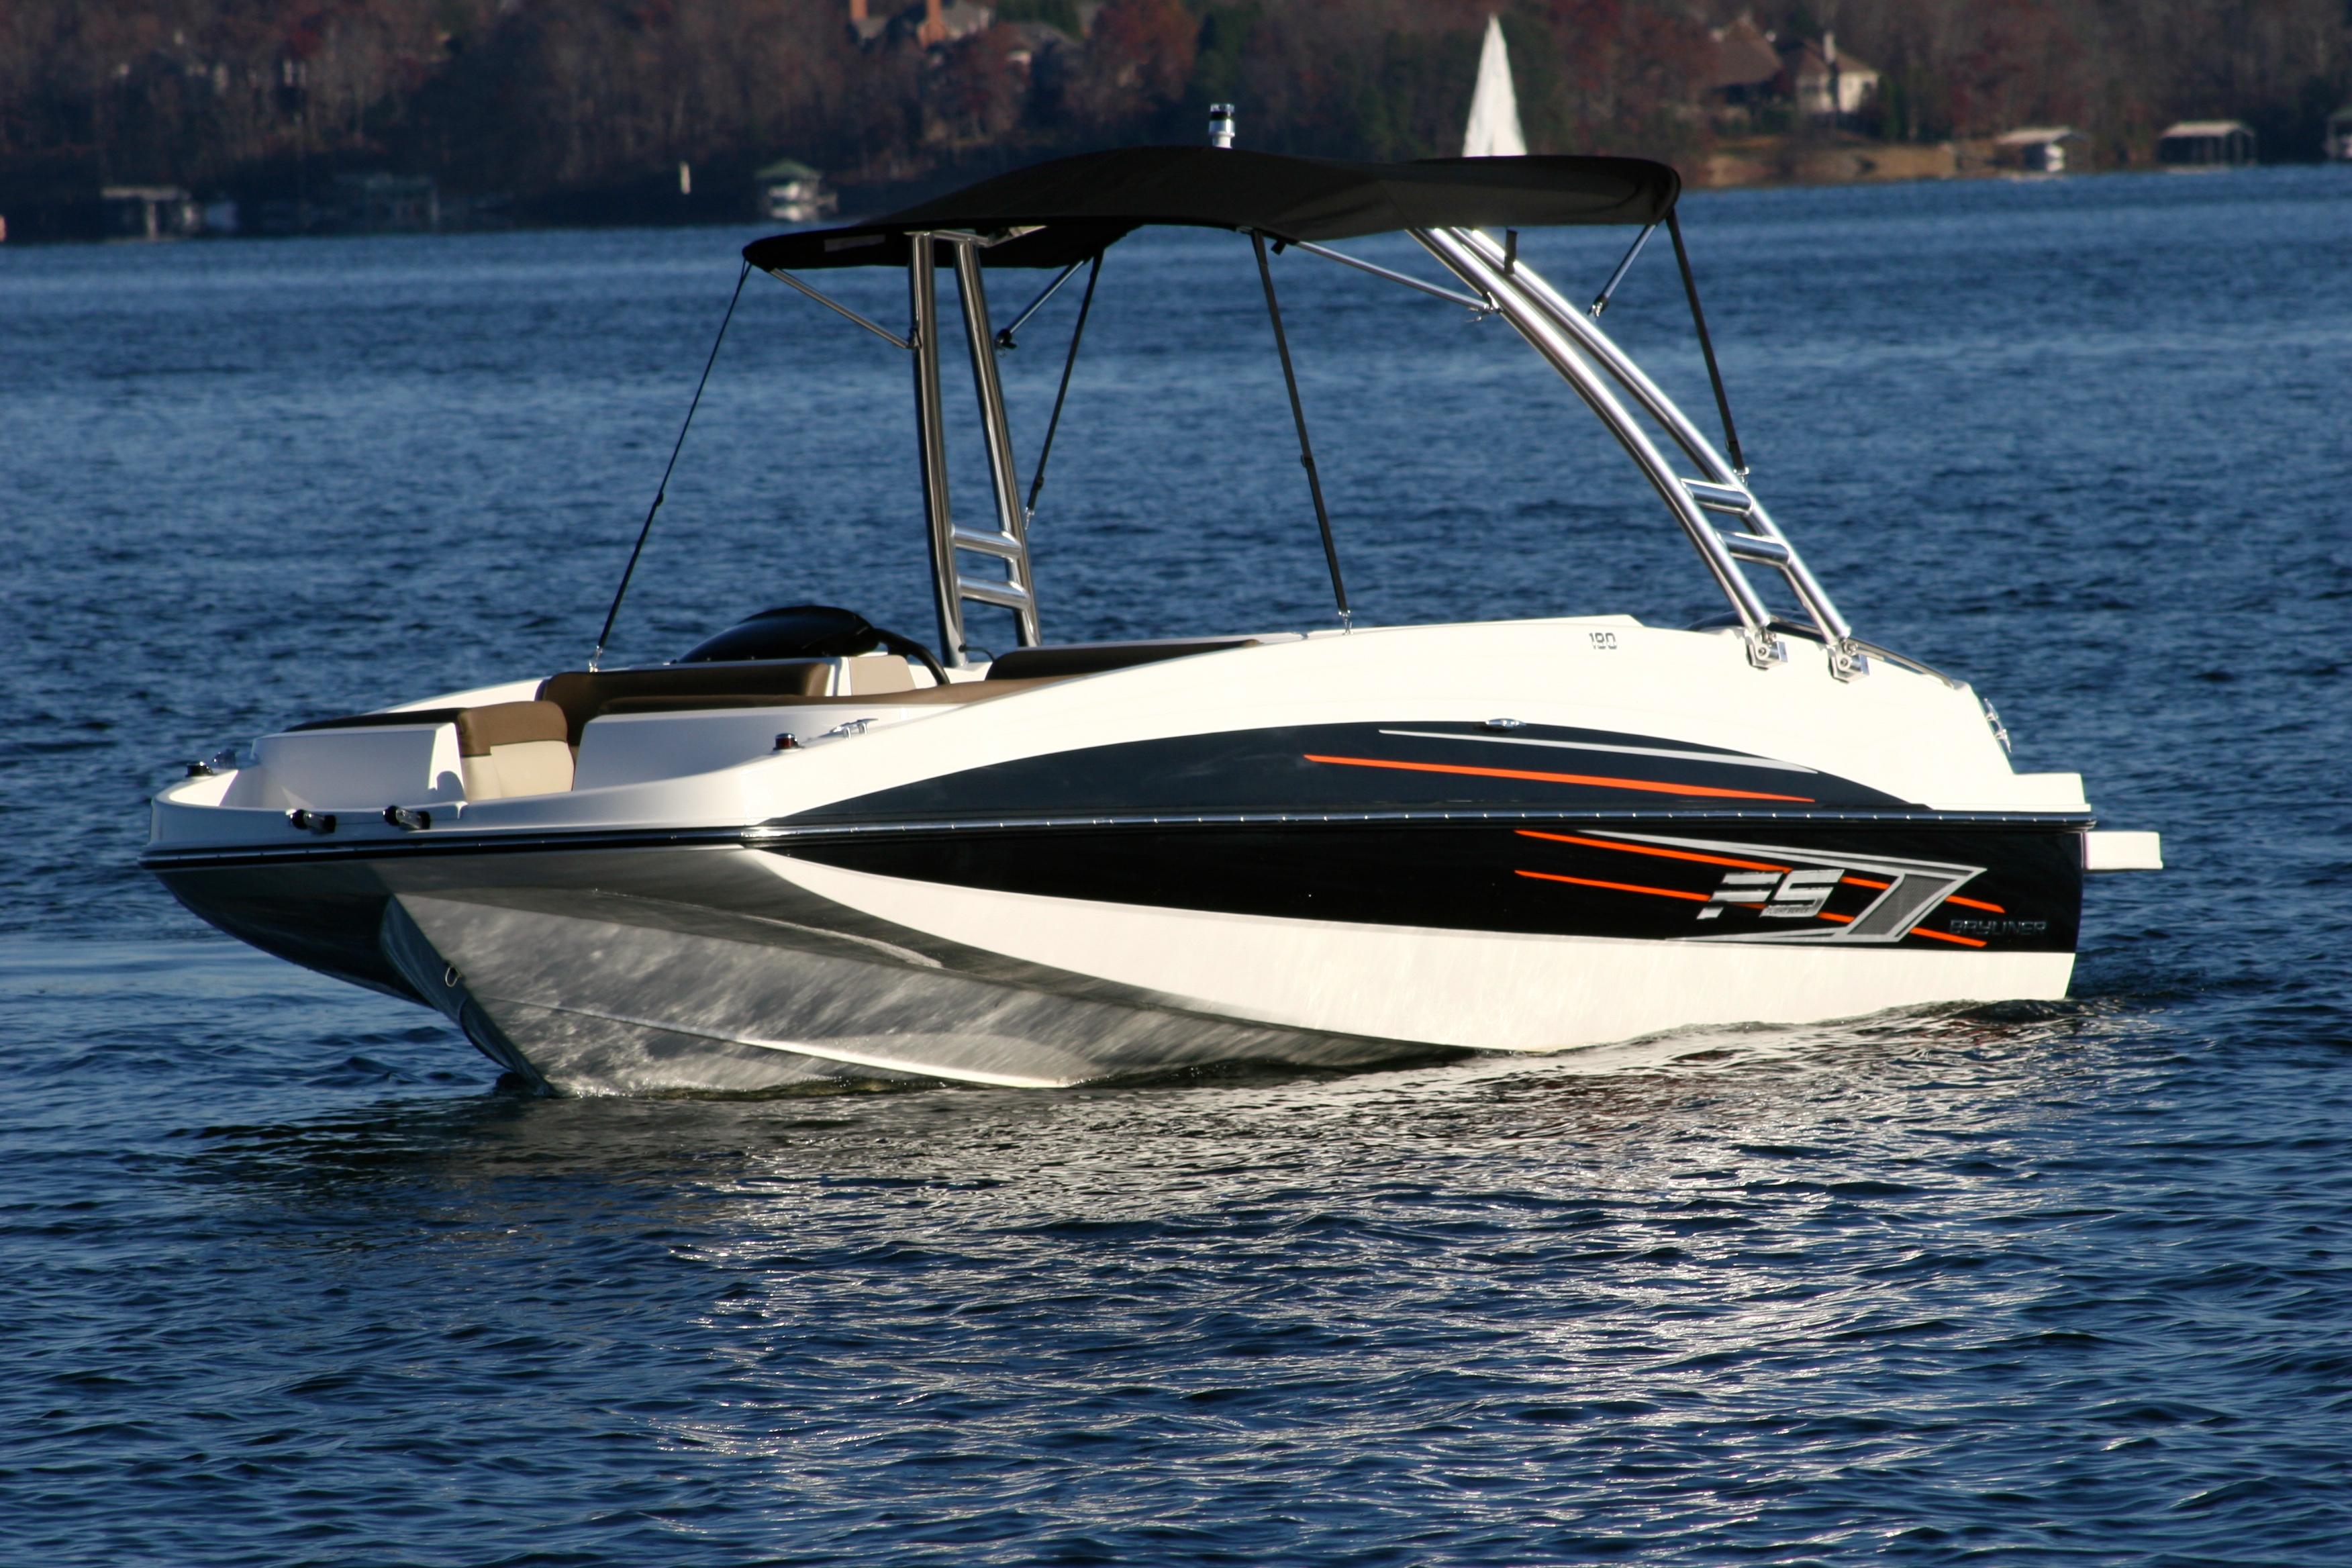 lake conroe boat rentals, jet ski rentals lake conroe, pontoon rentals, fun on lake conroe, things to do on lake conroe